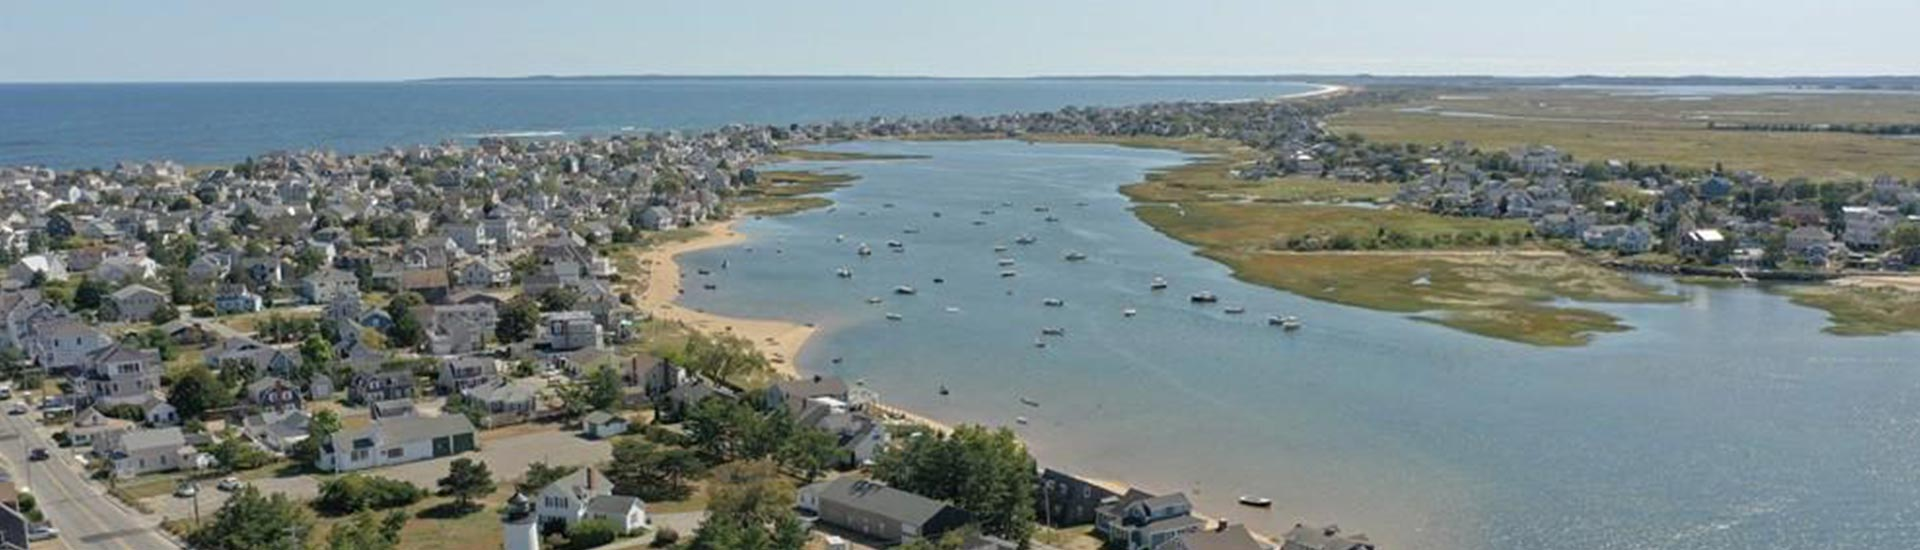 Plum Island Beach Rentals Vacation Rental Management Company Real Estate